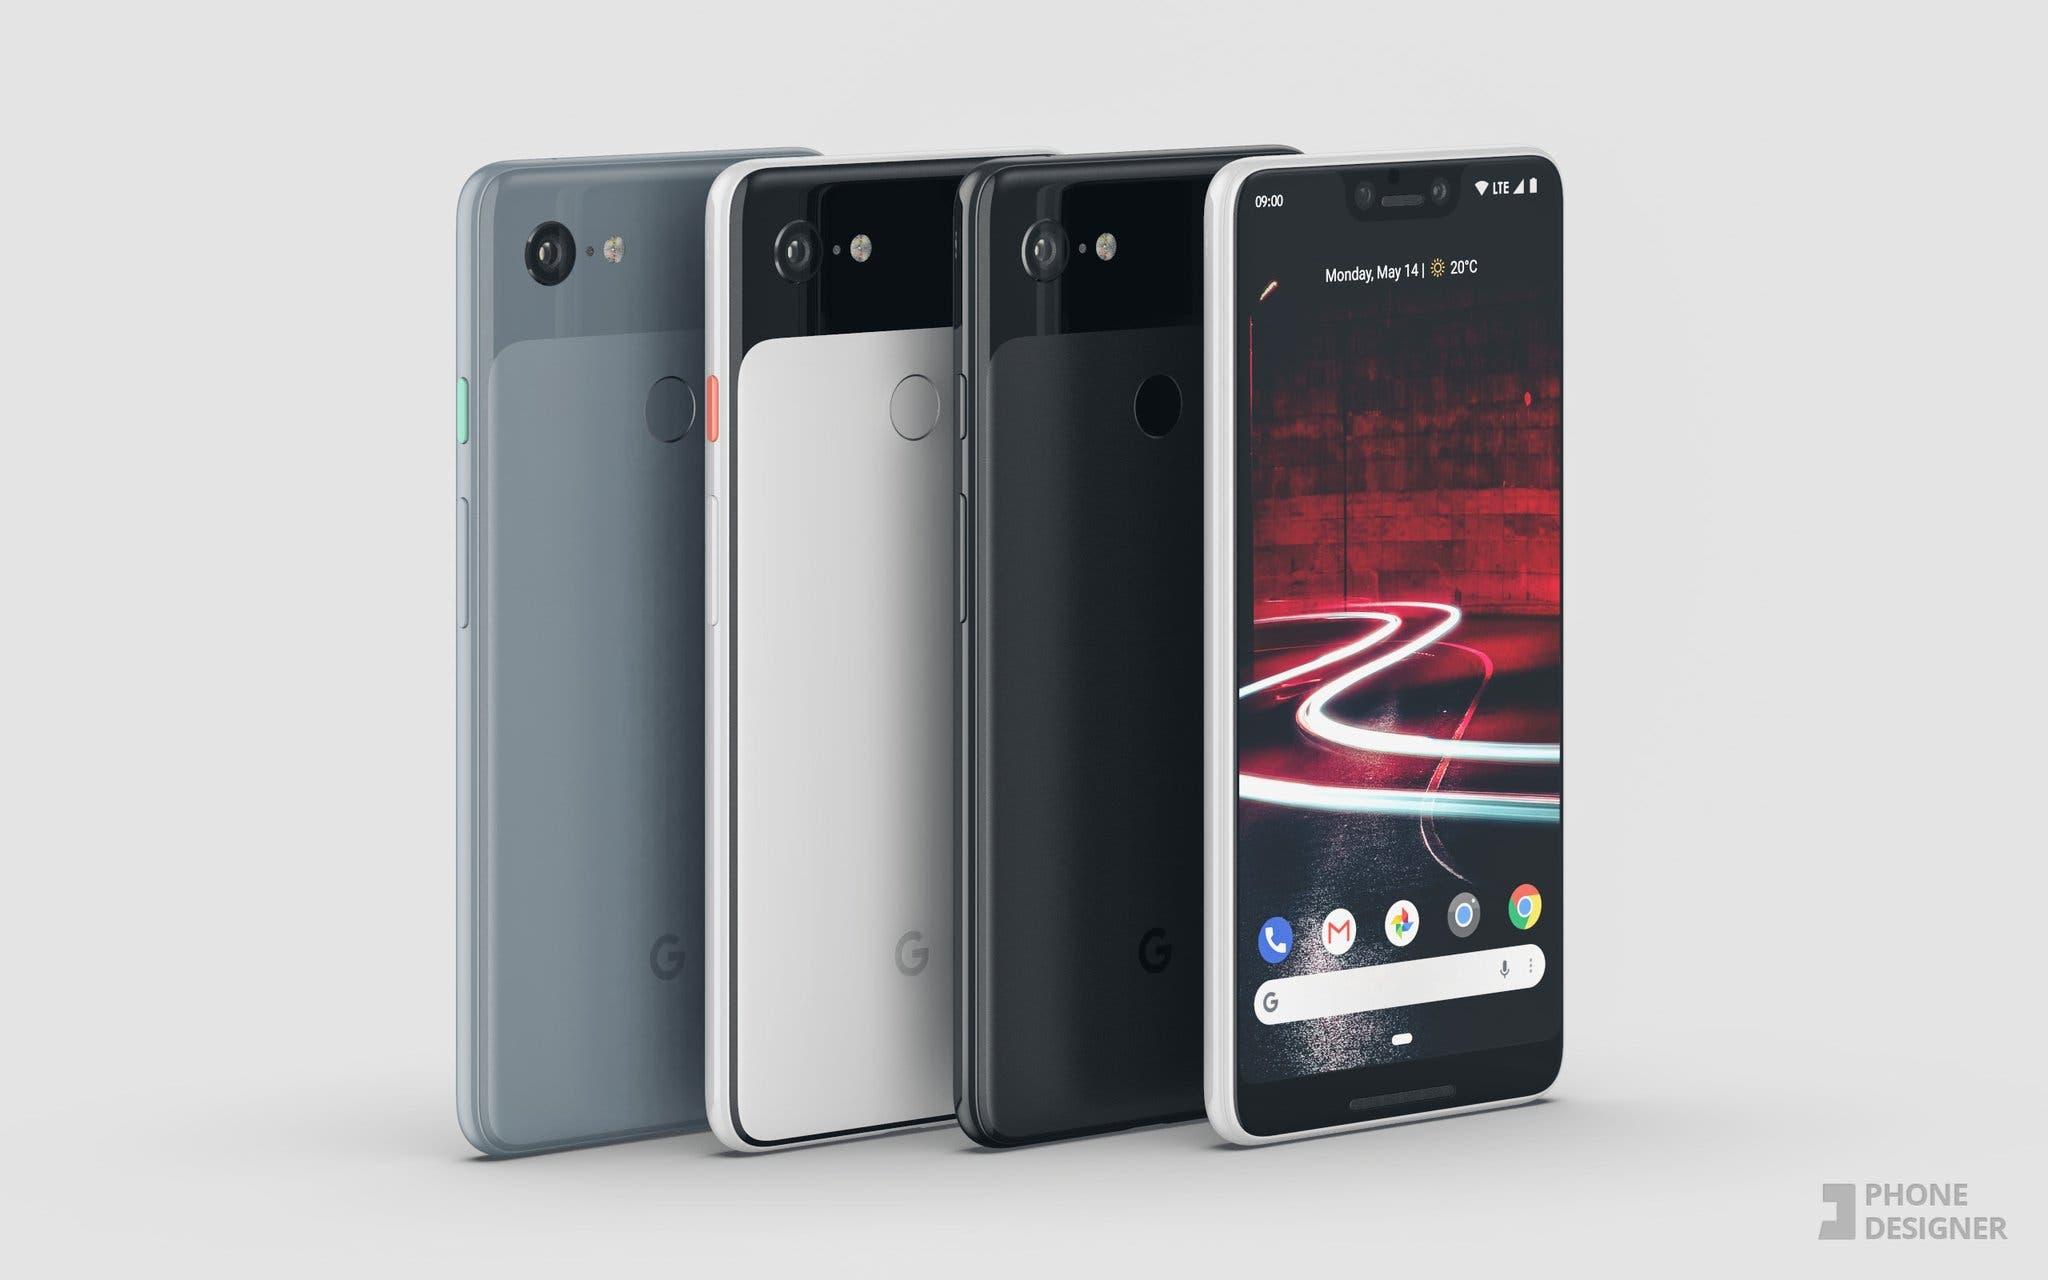 Google Pixel 3 XL by Phone Designer